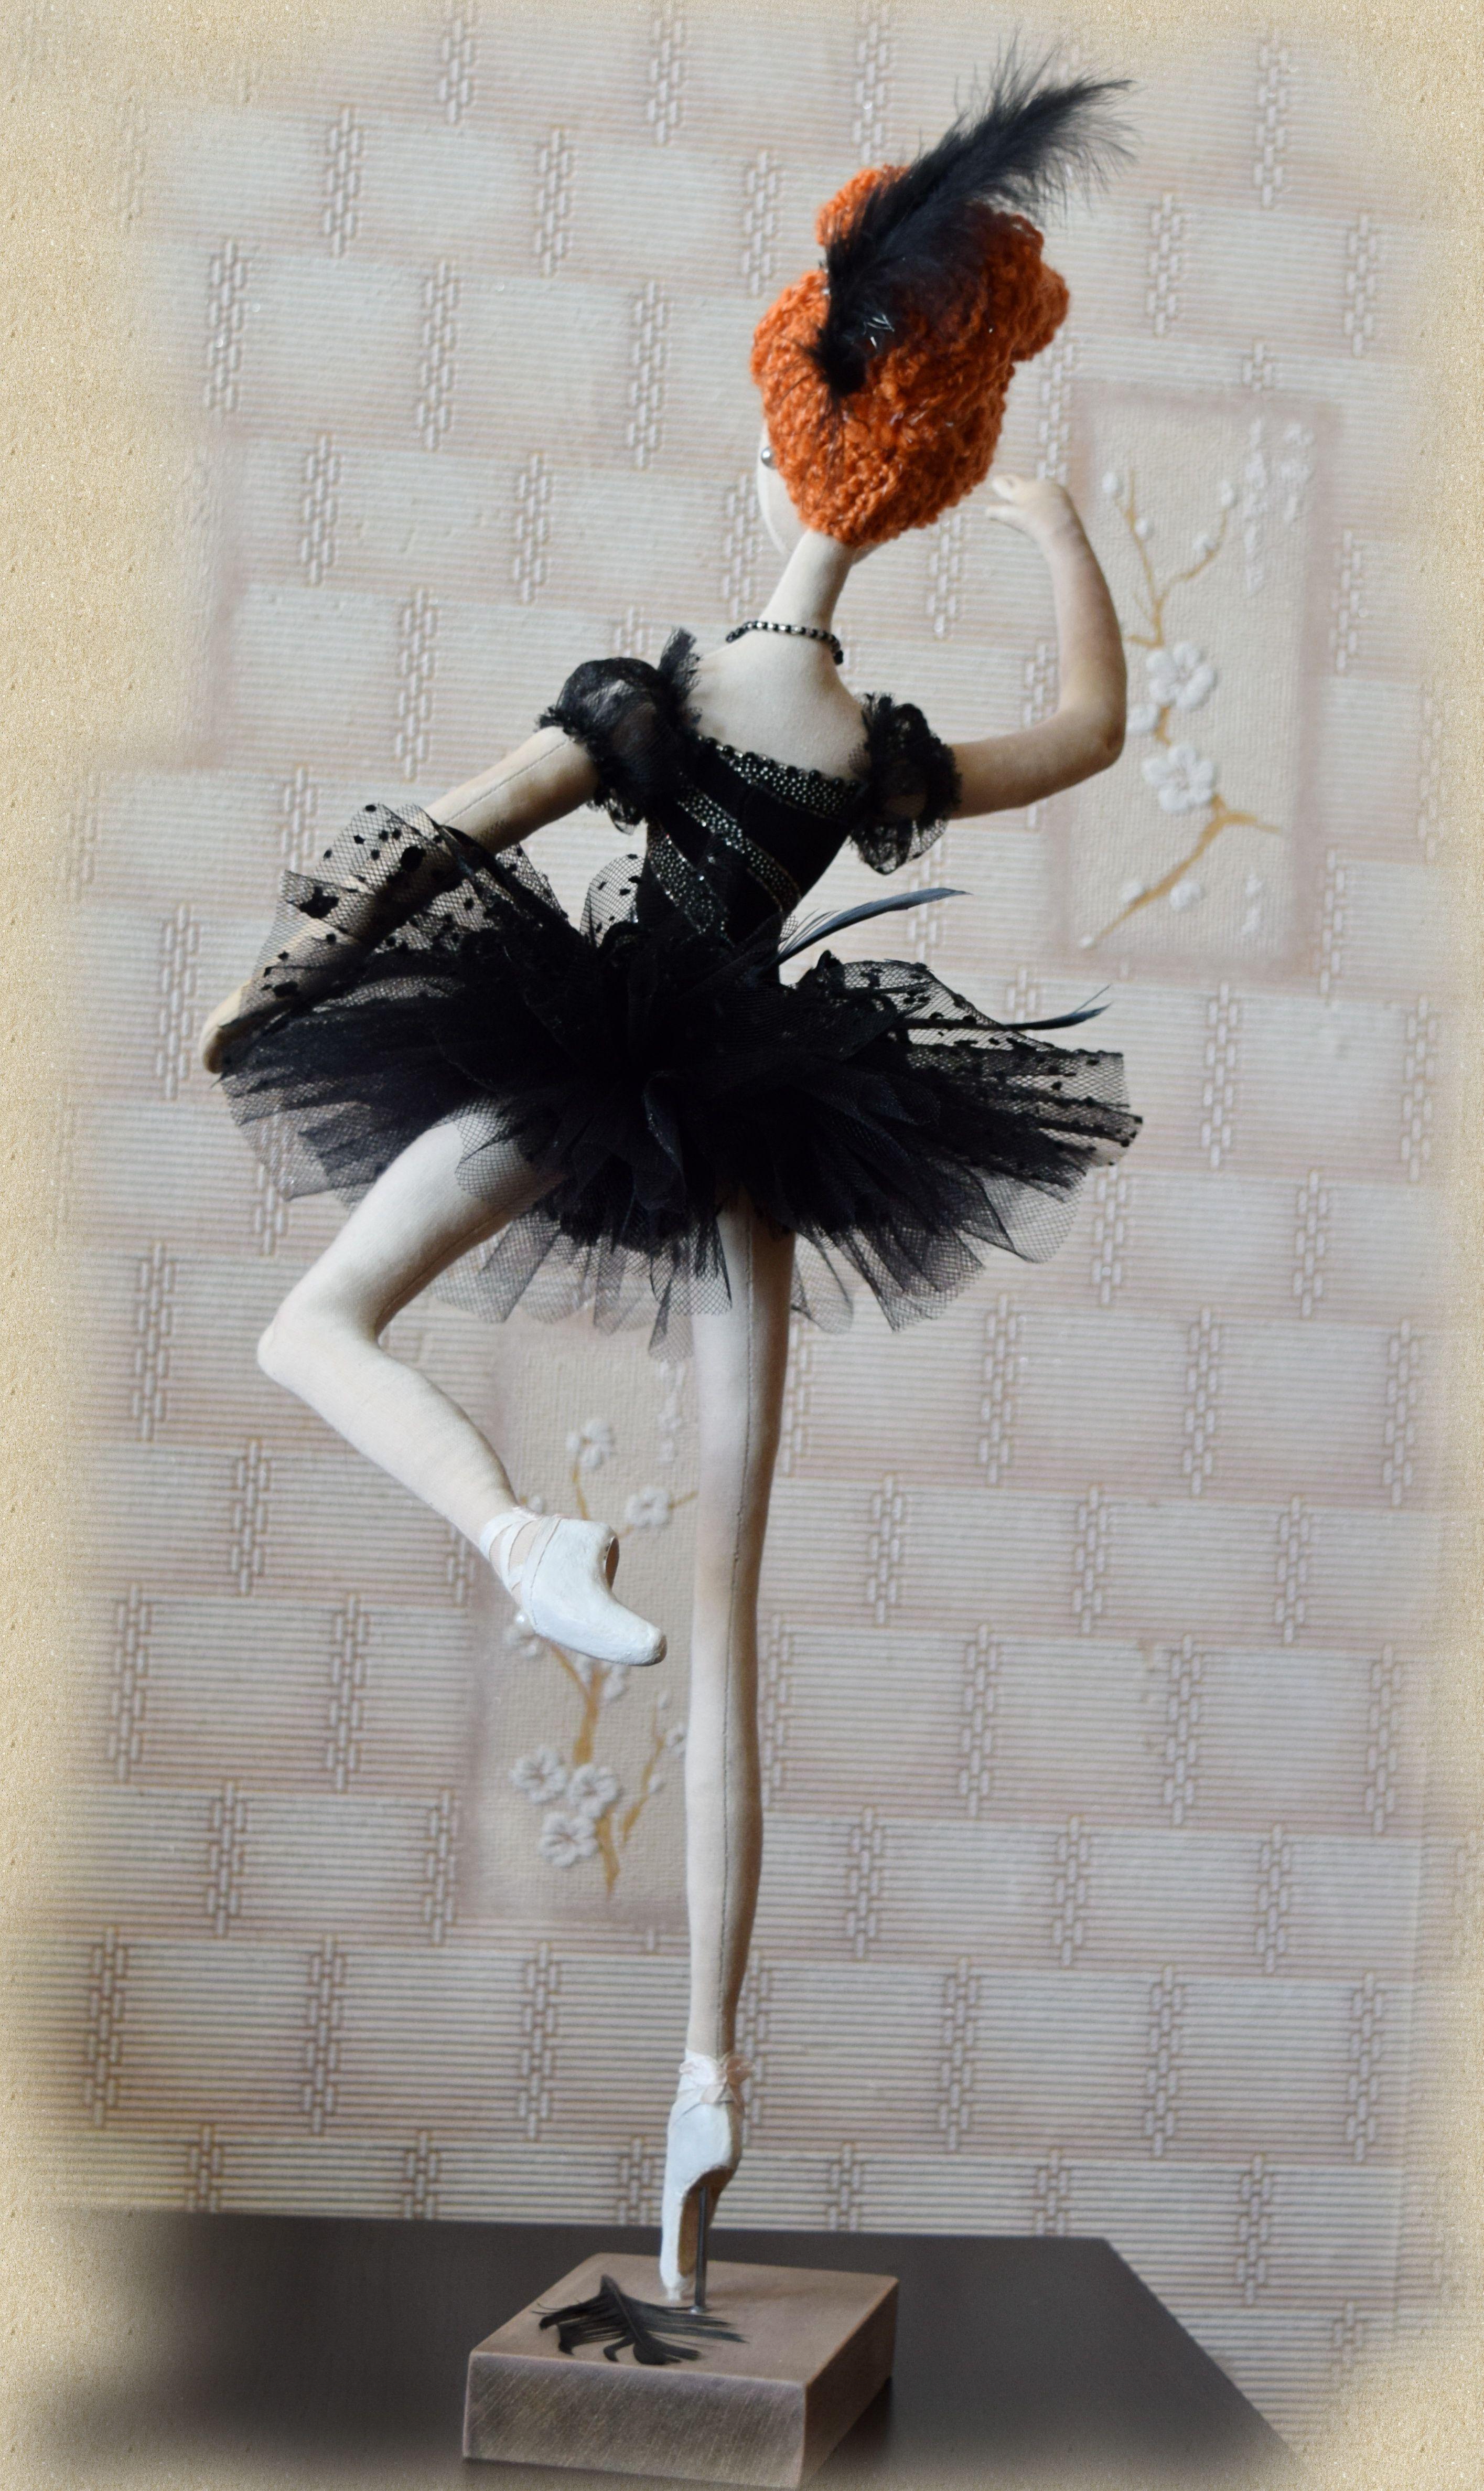 ручнаяработа выставки куклабалерина балет сувенир женщине кукла hendmade девушке подарок